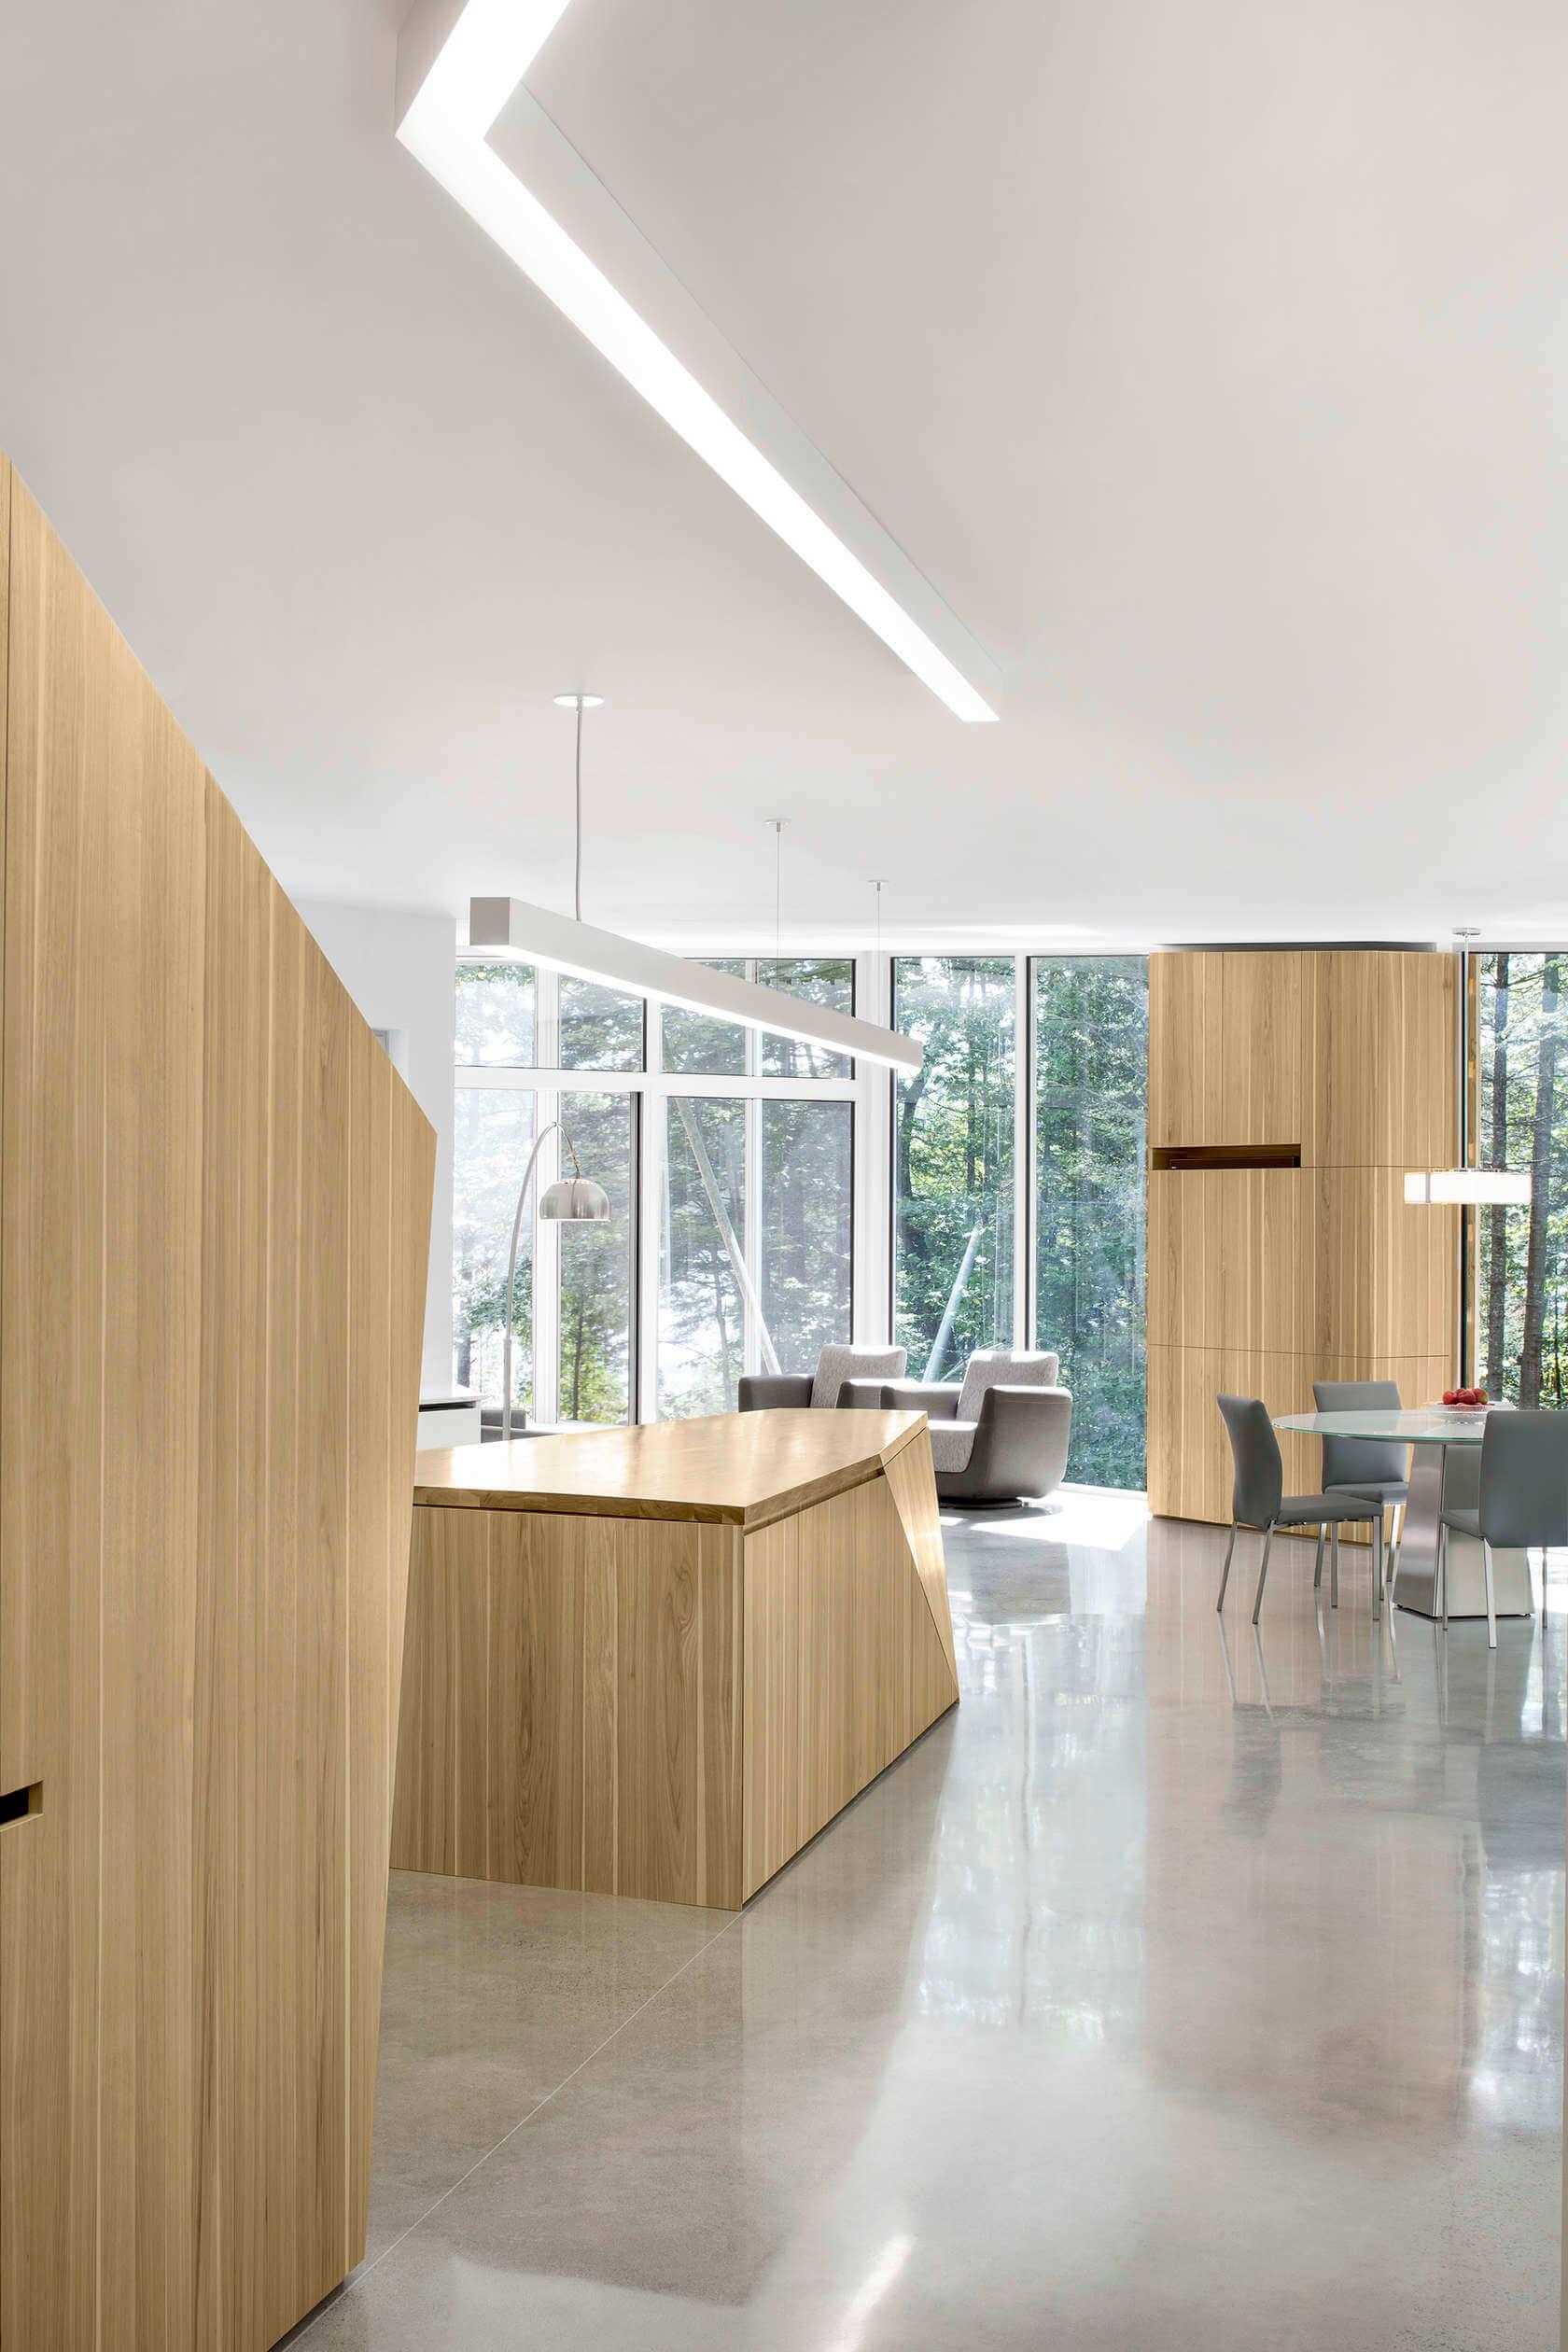 architecture_house_apartment_design_studia_interiors_osnovadesign_osnova_poltava_04